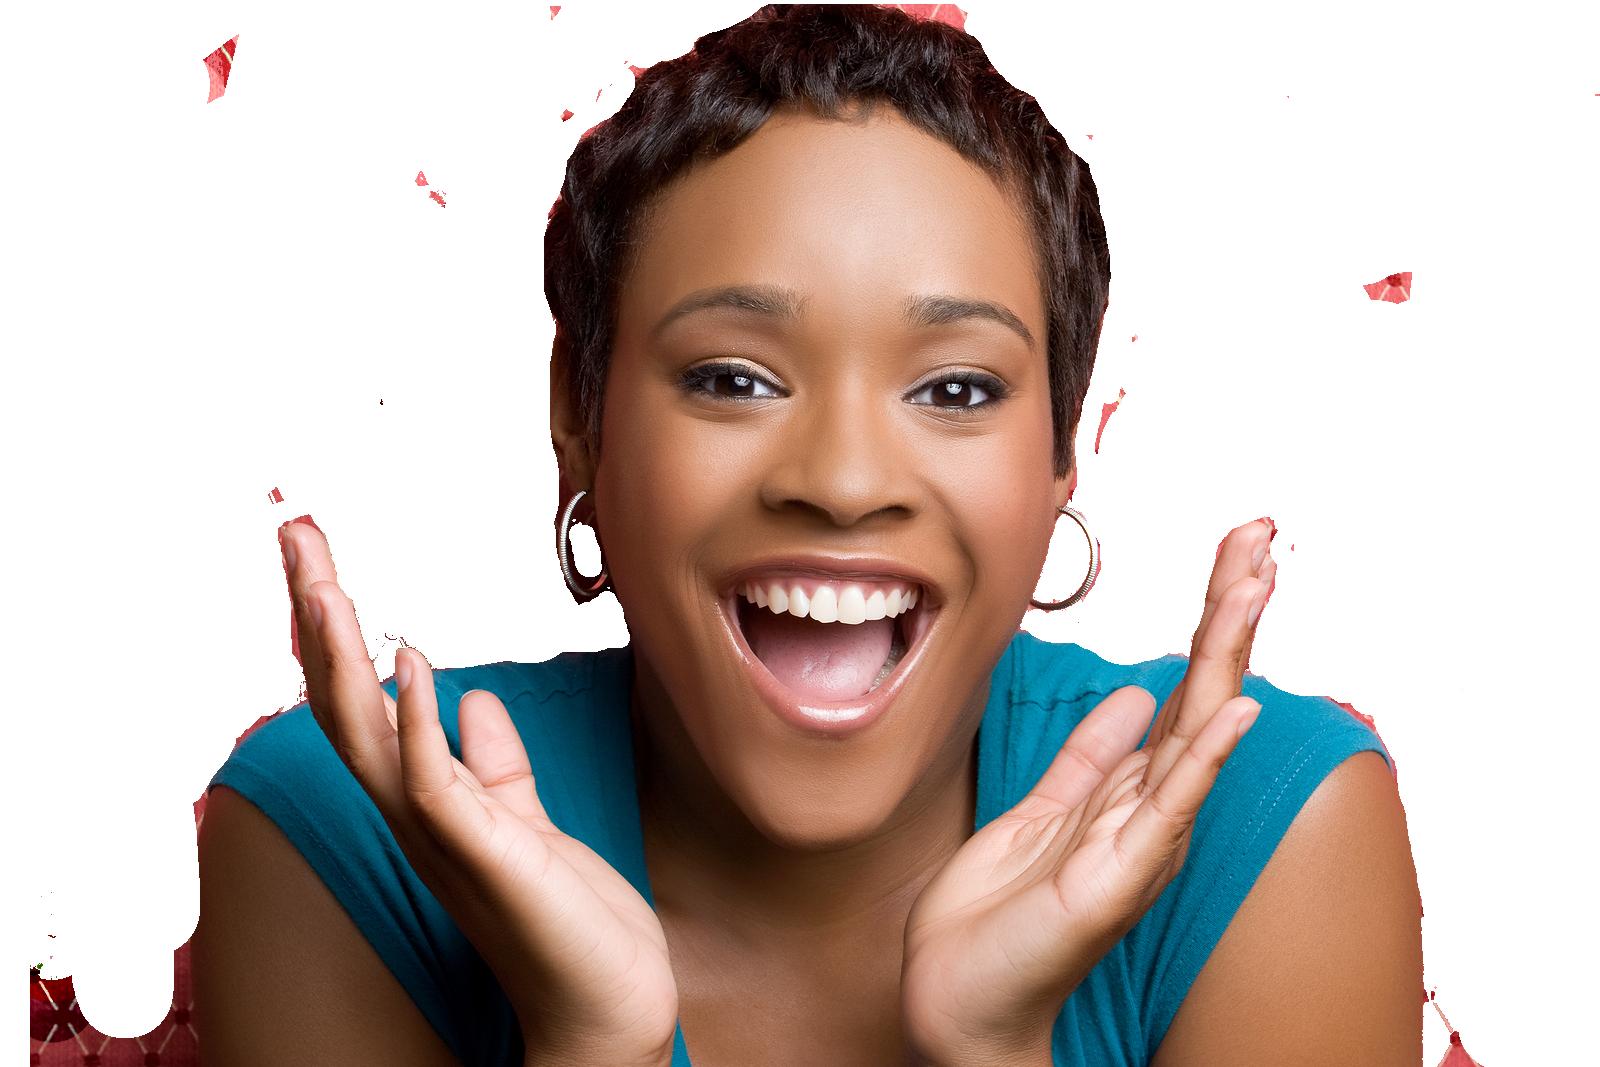 Happiness clip art black. Clipart smile woman smile